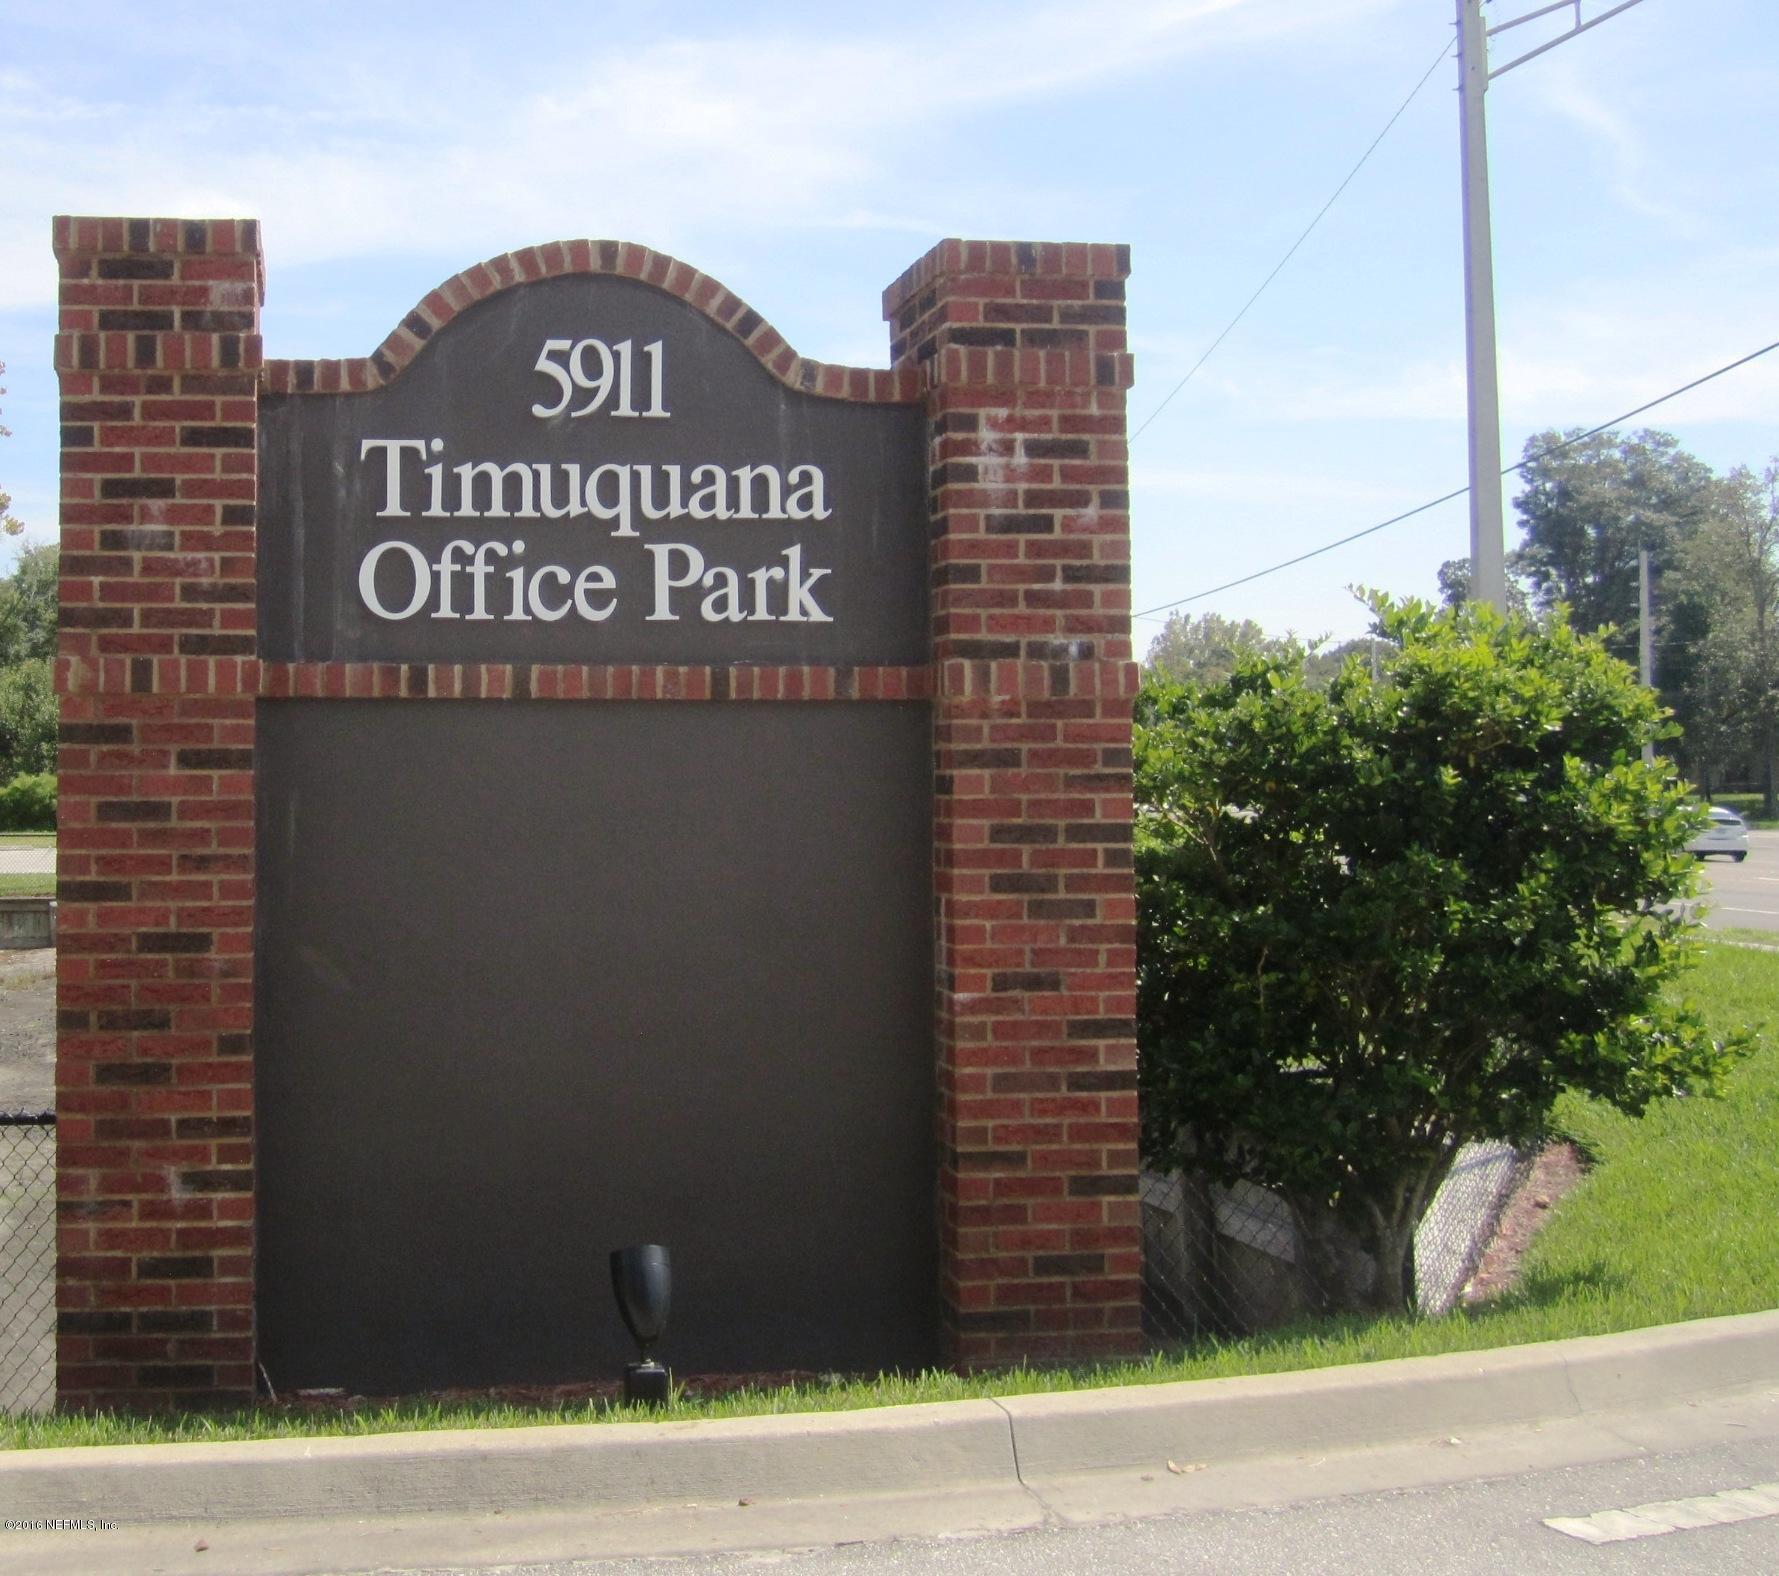 5911 TIMUQUANA RD, JACKSONVILLE, FL 32210